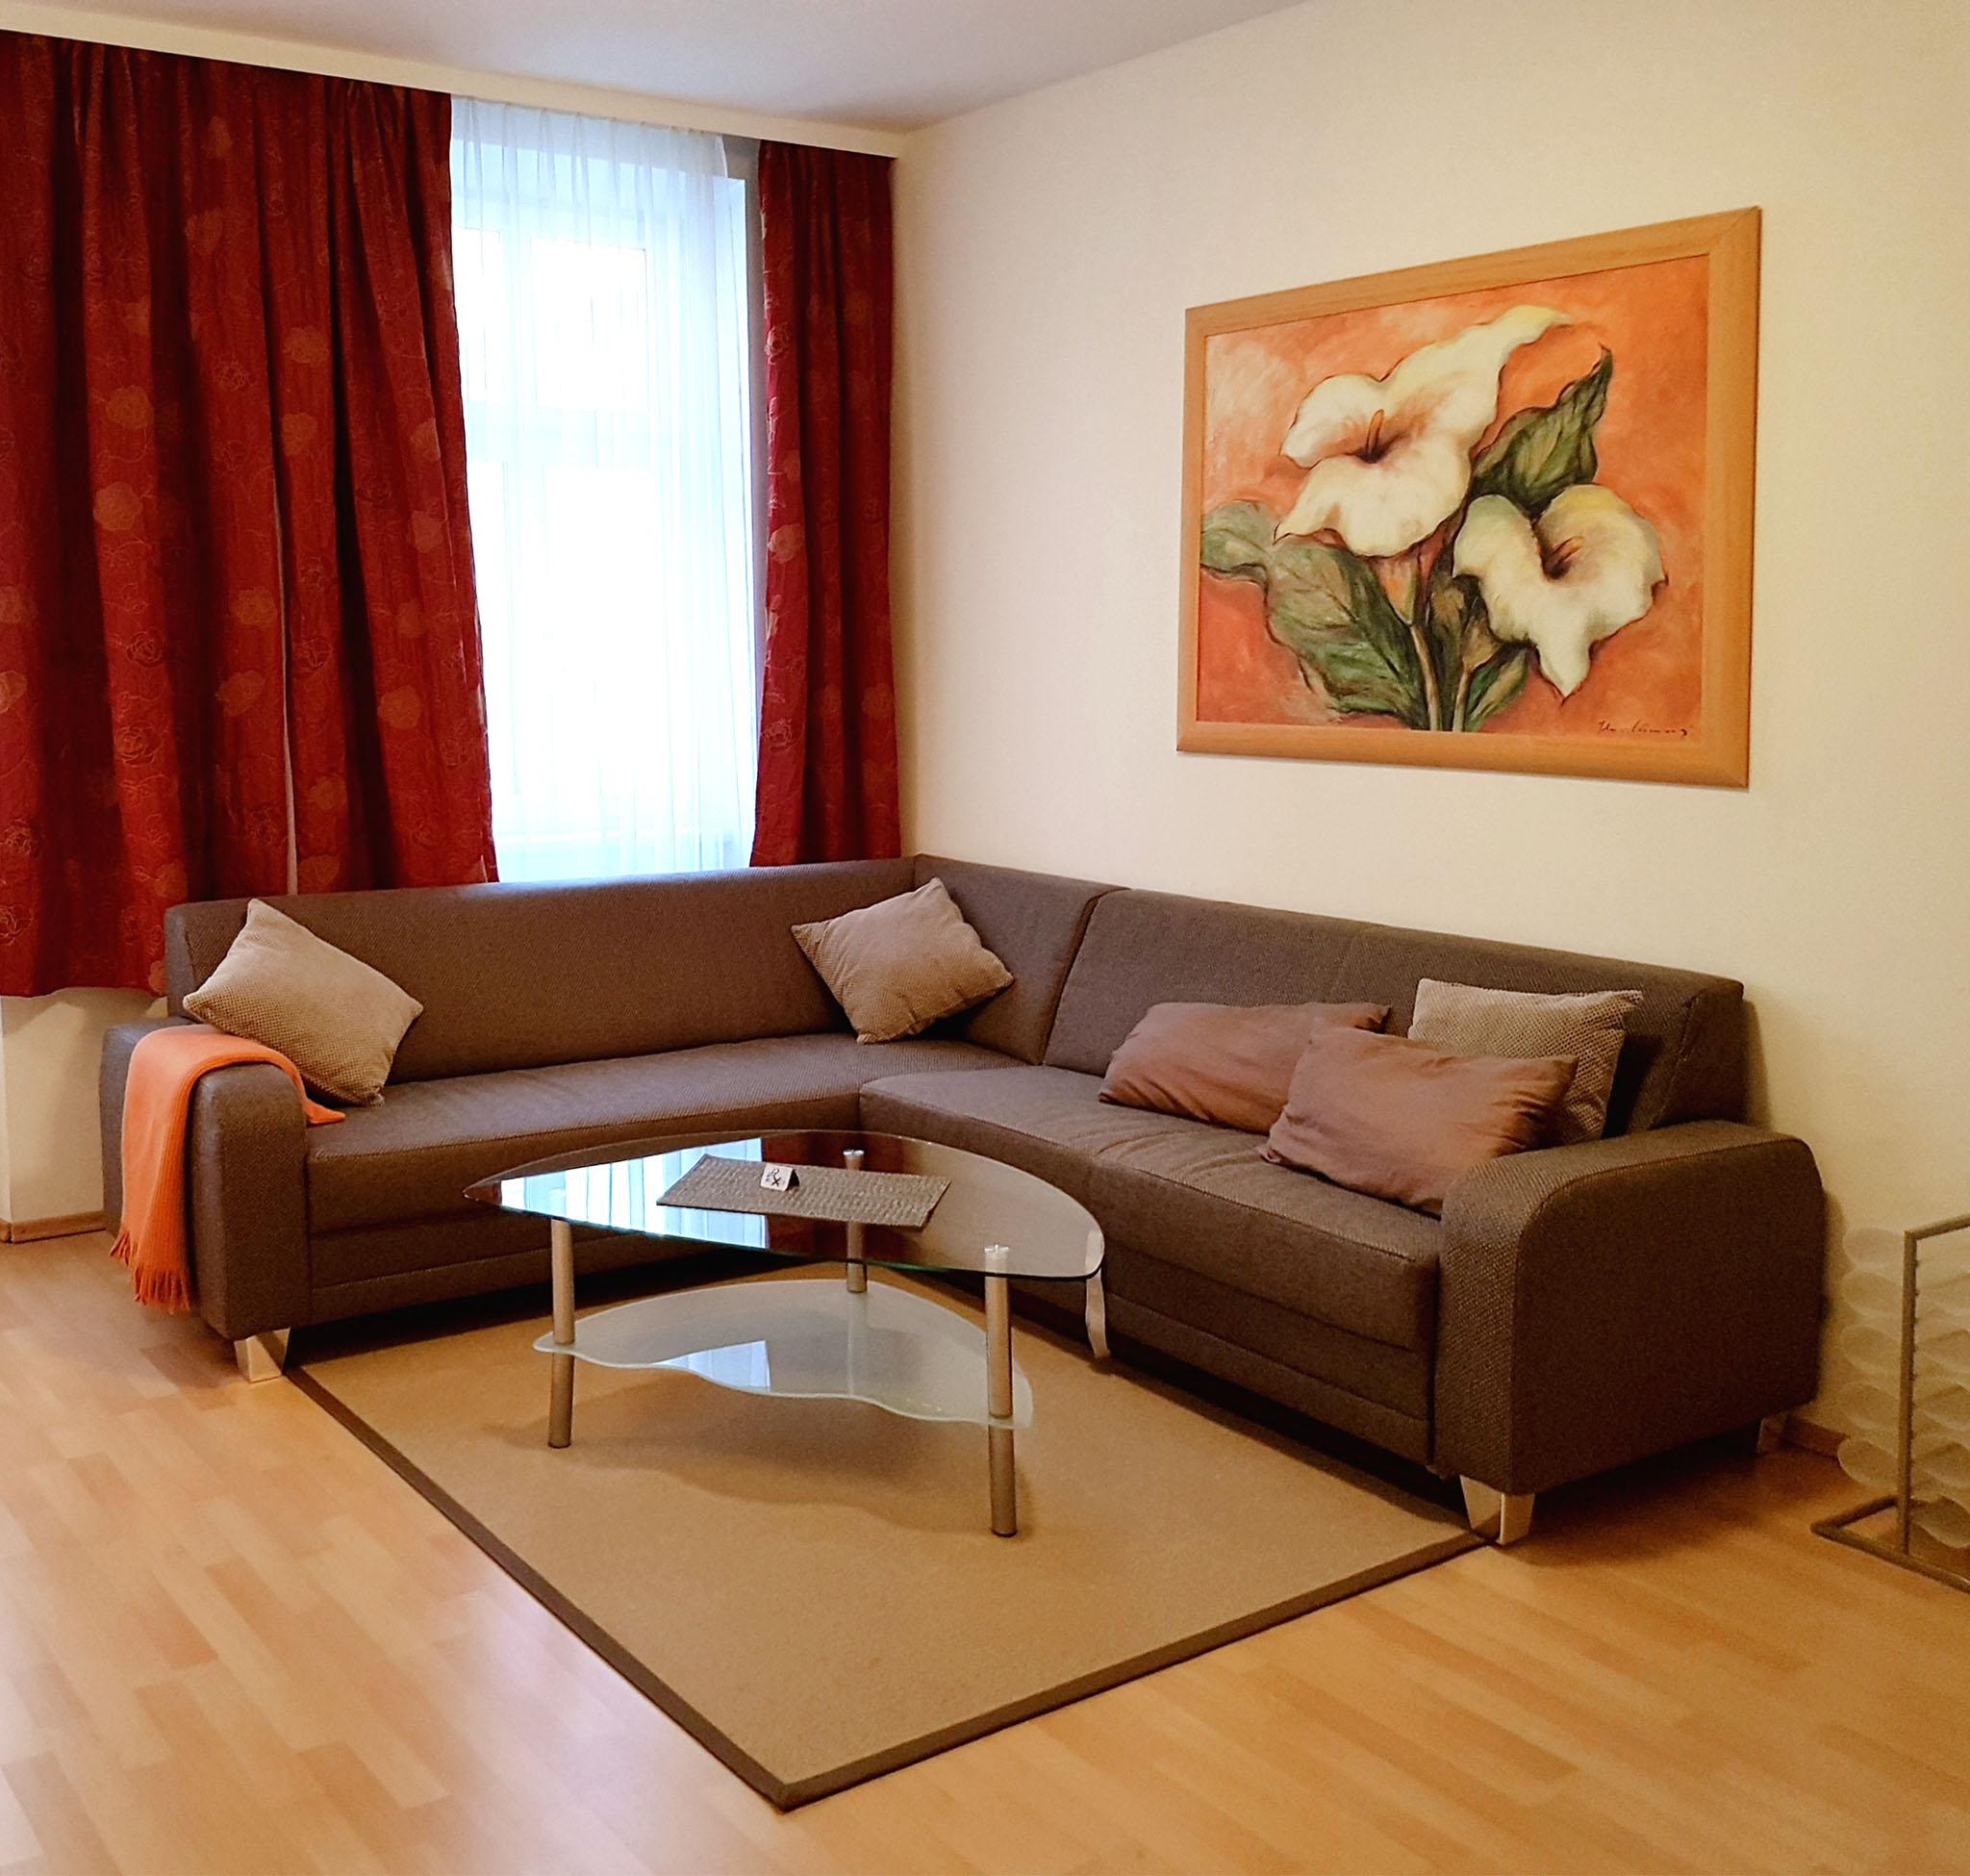 ... Serviced Apartment Wien, Typ Comfort   Apartment Wien Riess Rotenhofgasse Komfort  ...